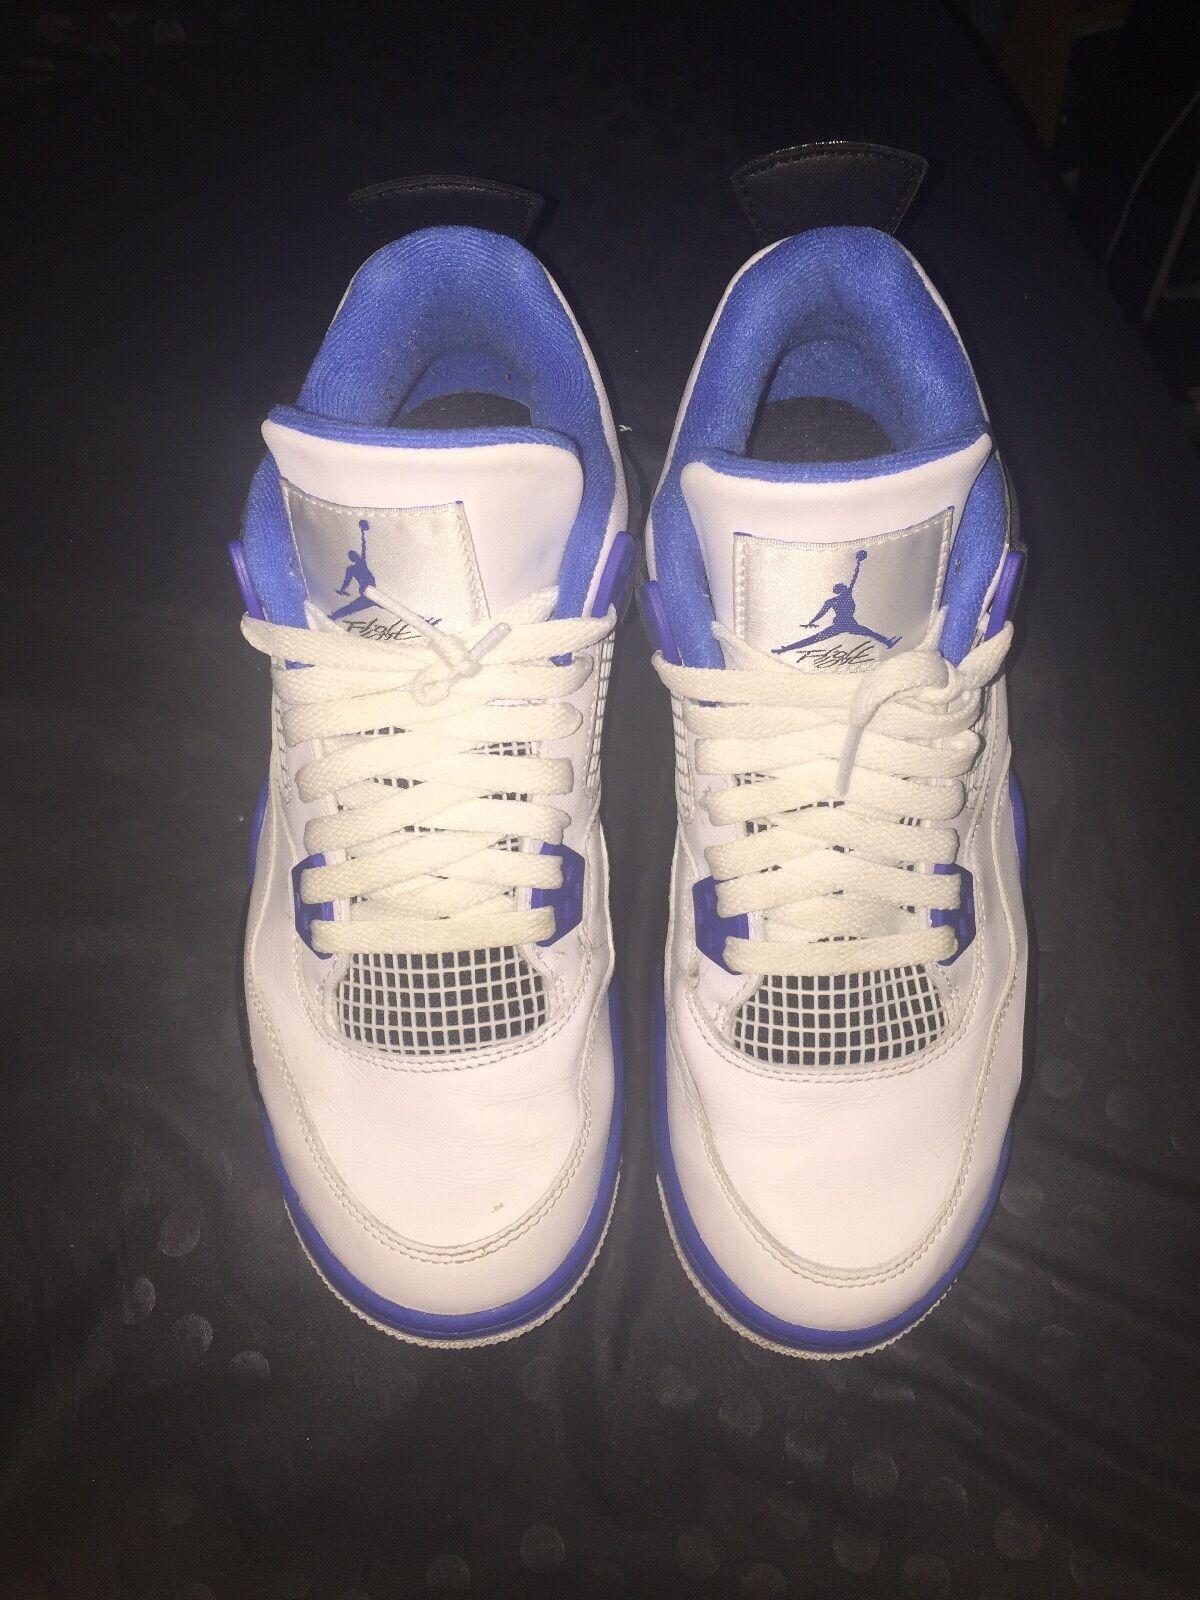 Blue Jordan Retro 4 Boy Size 7